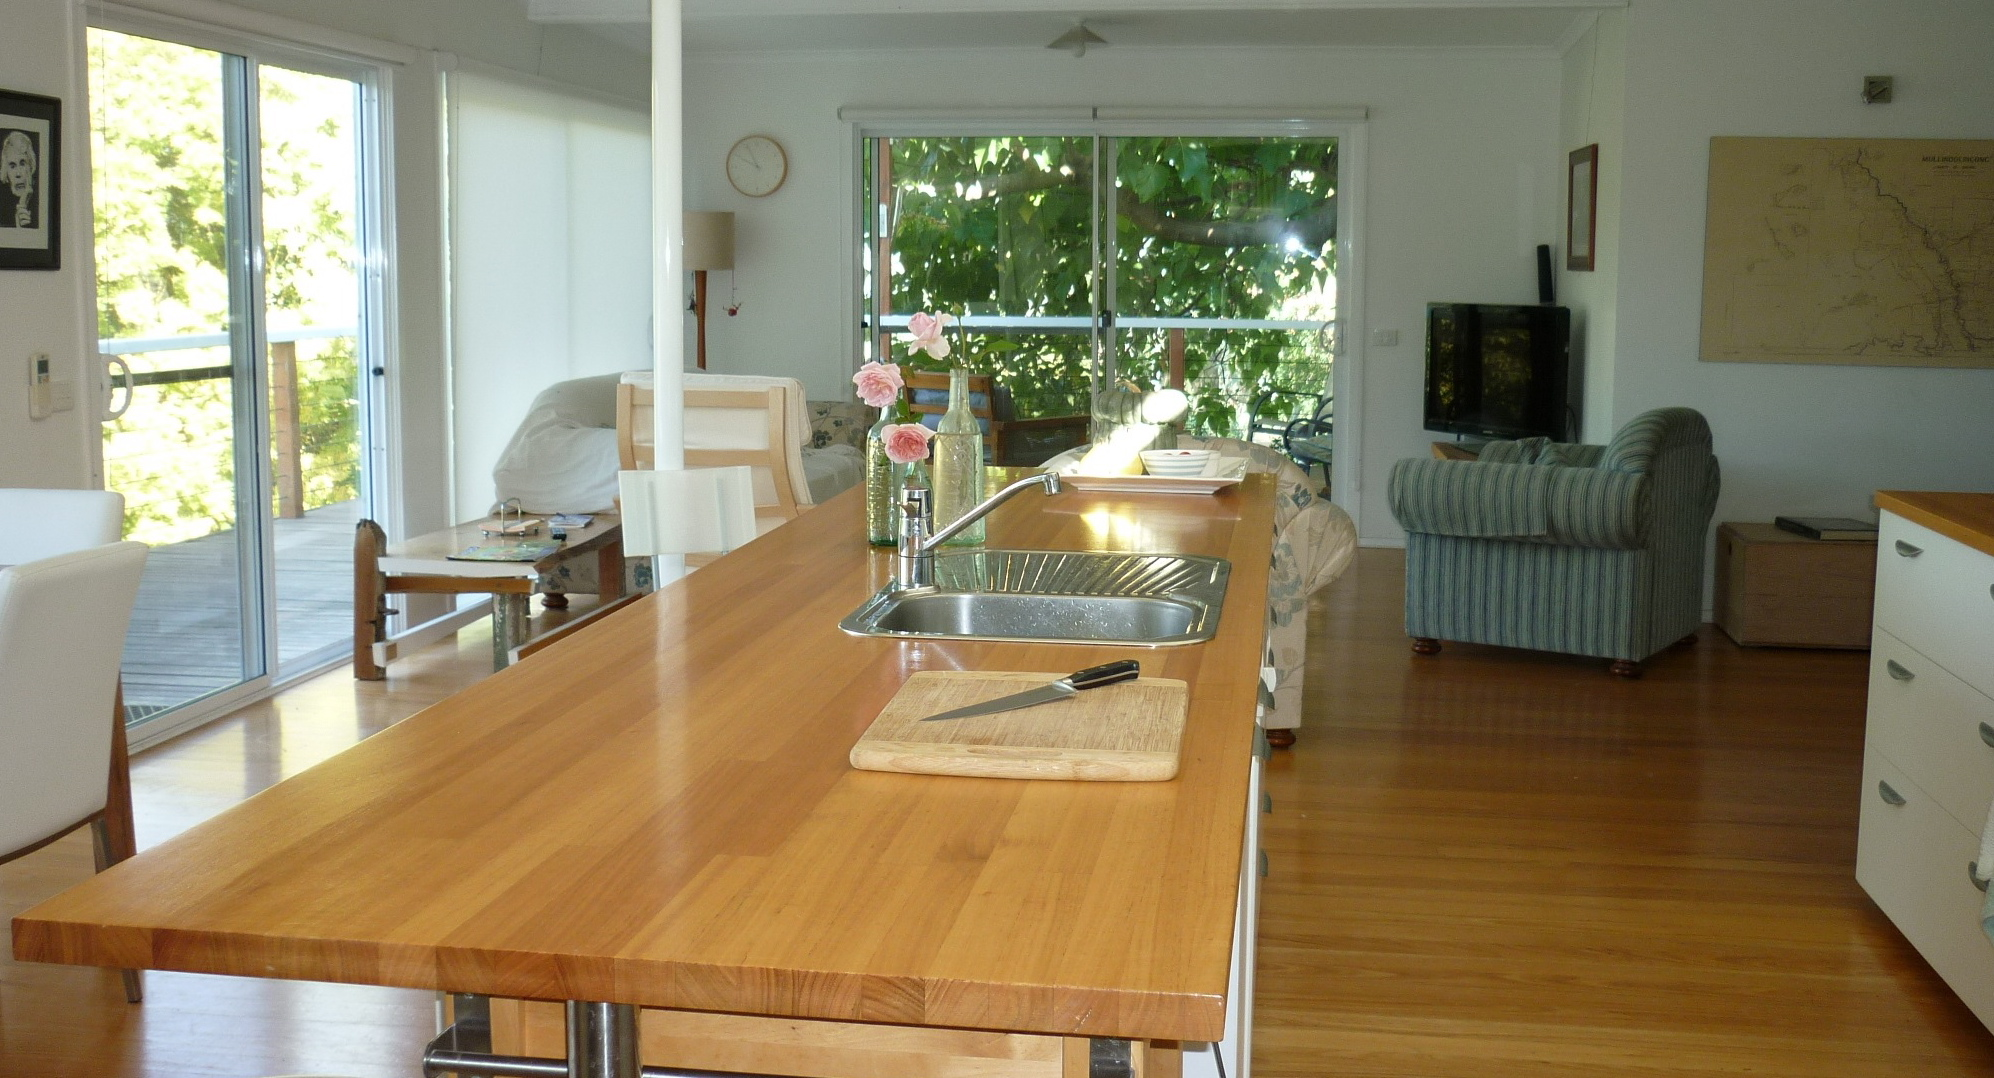 the kitchen bench